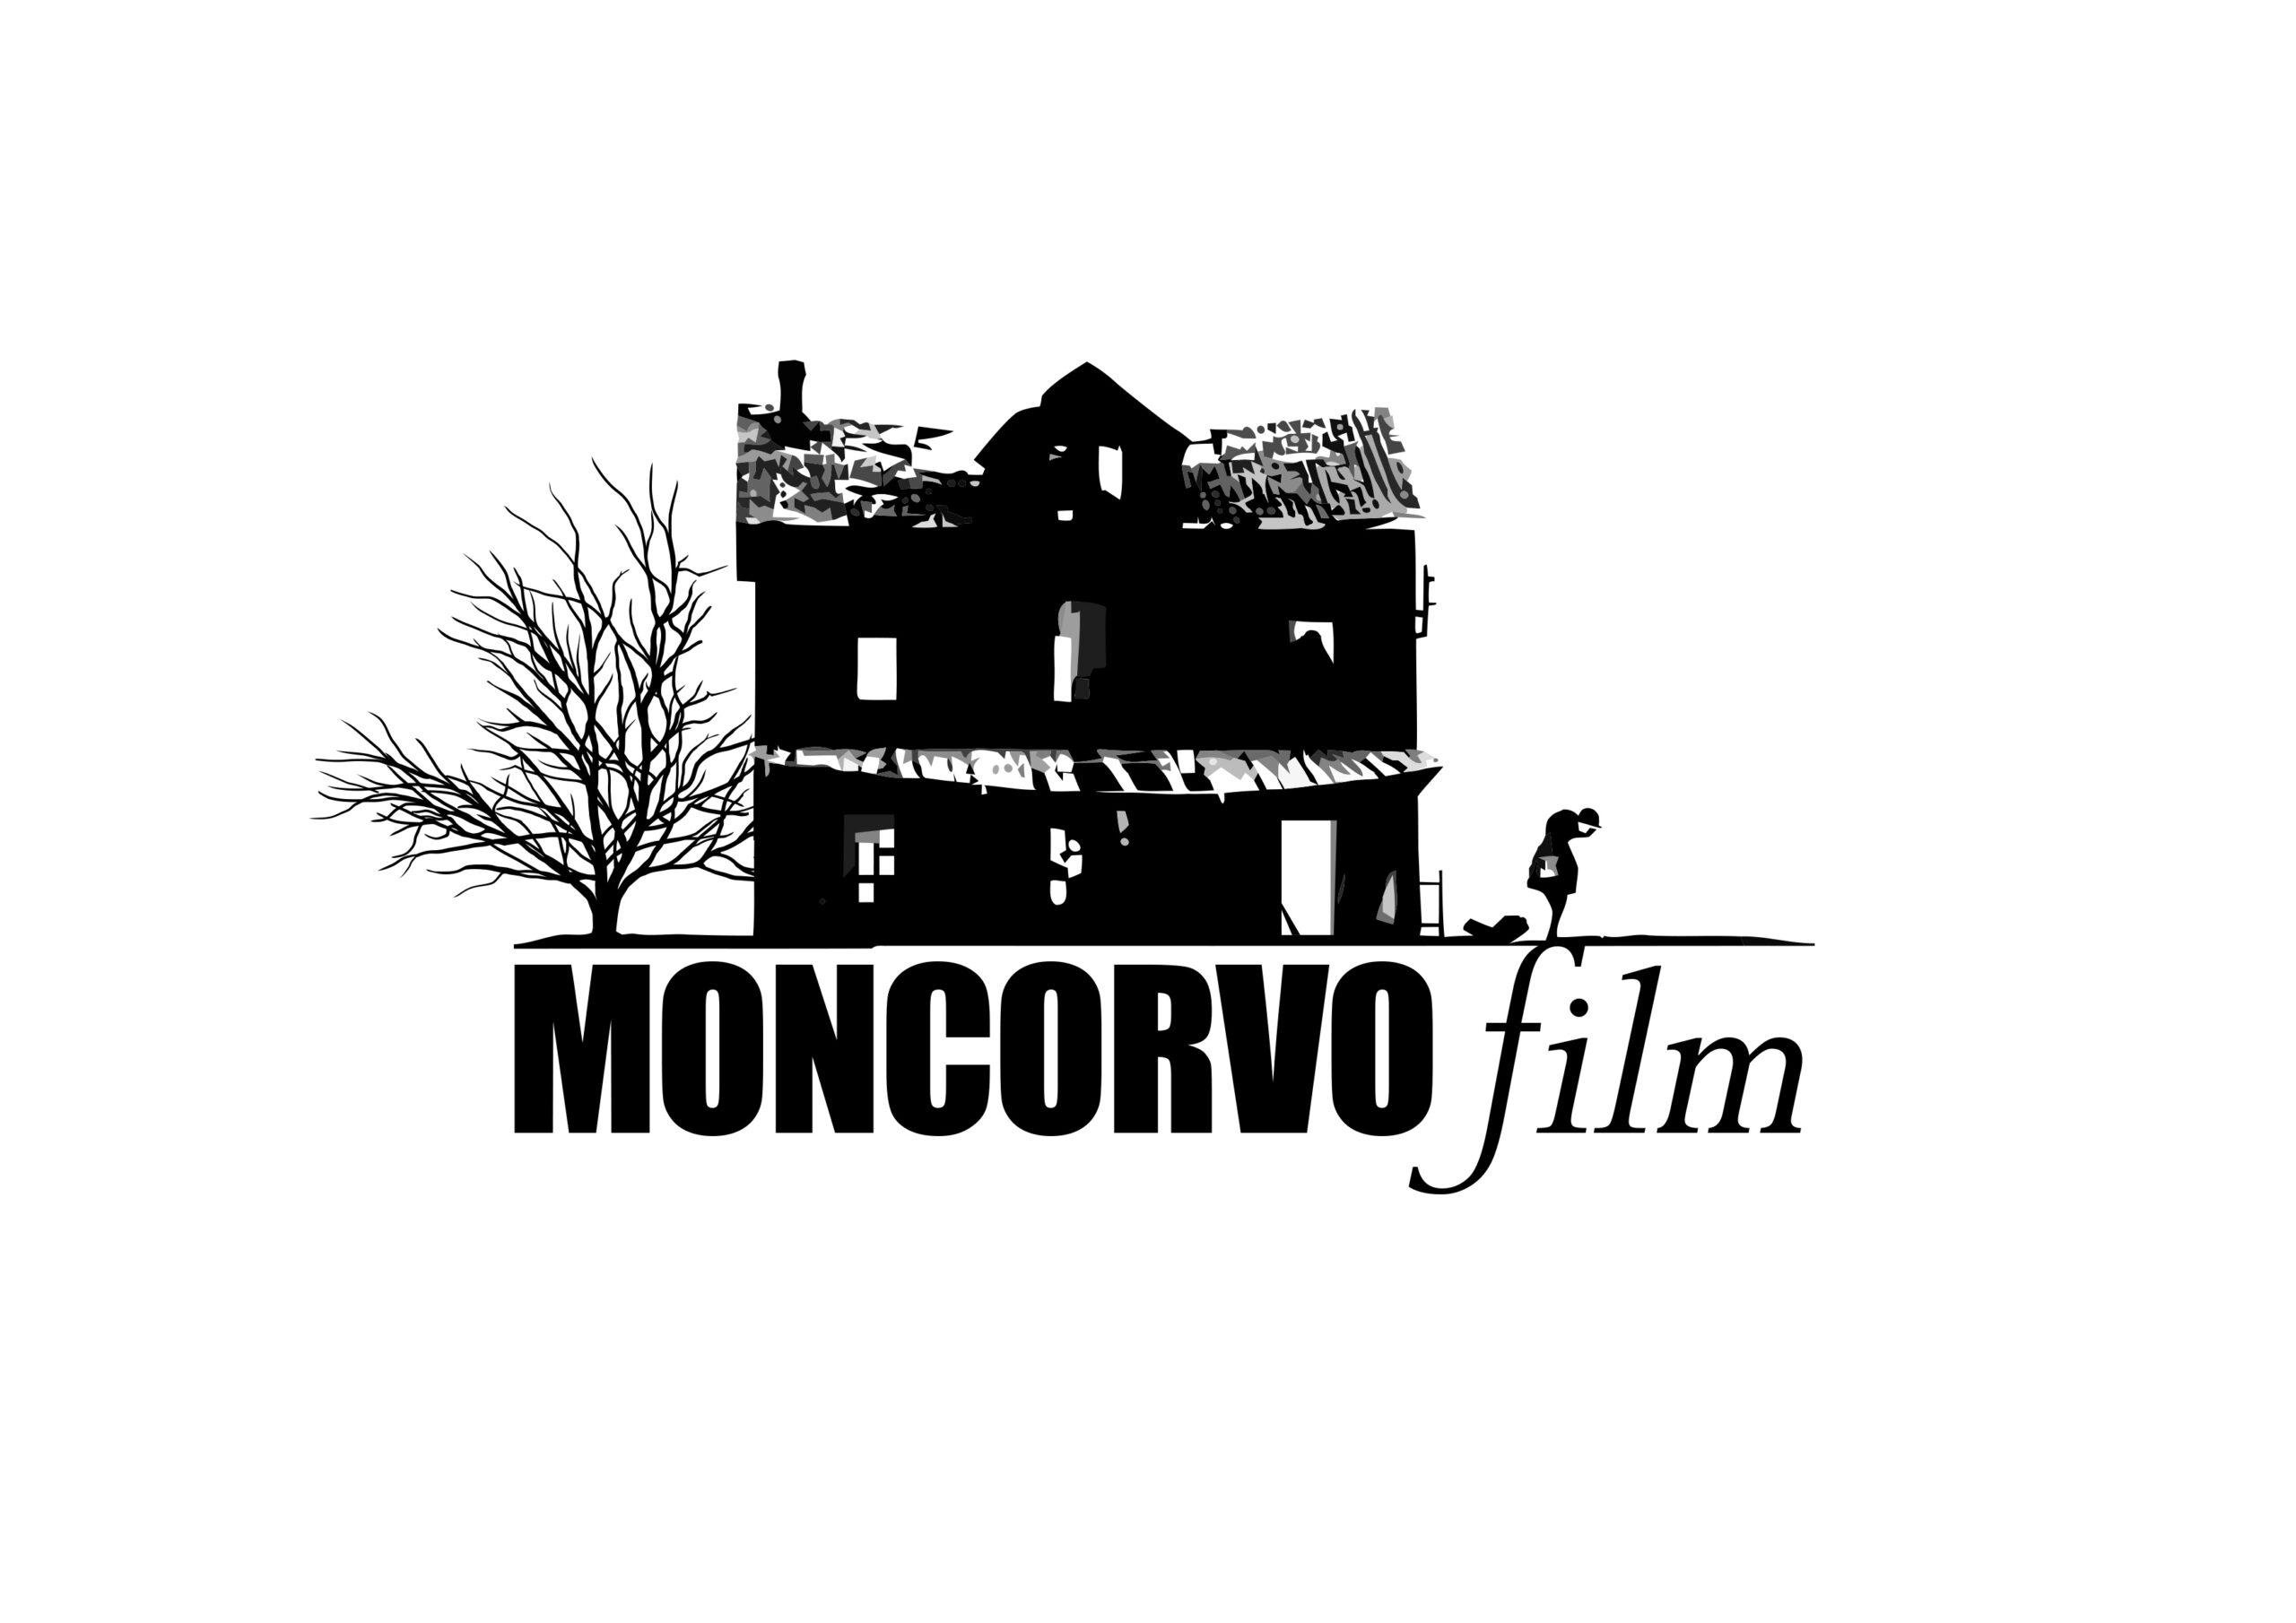 moncorvo film